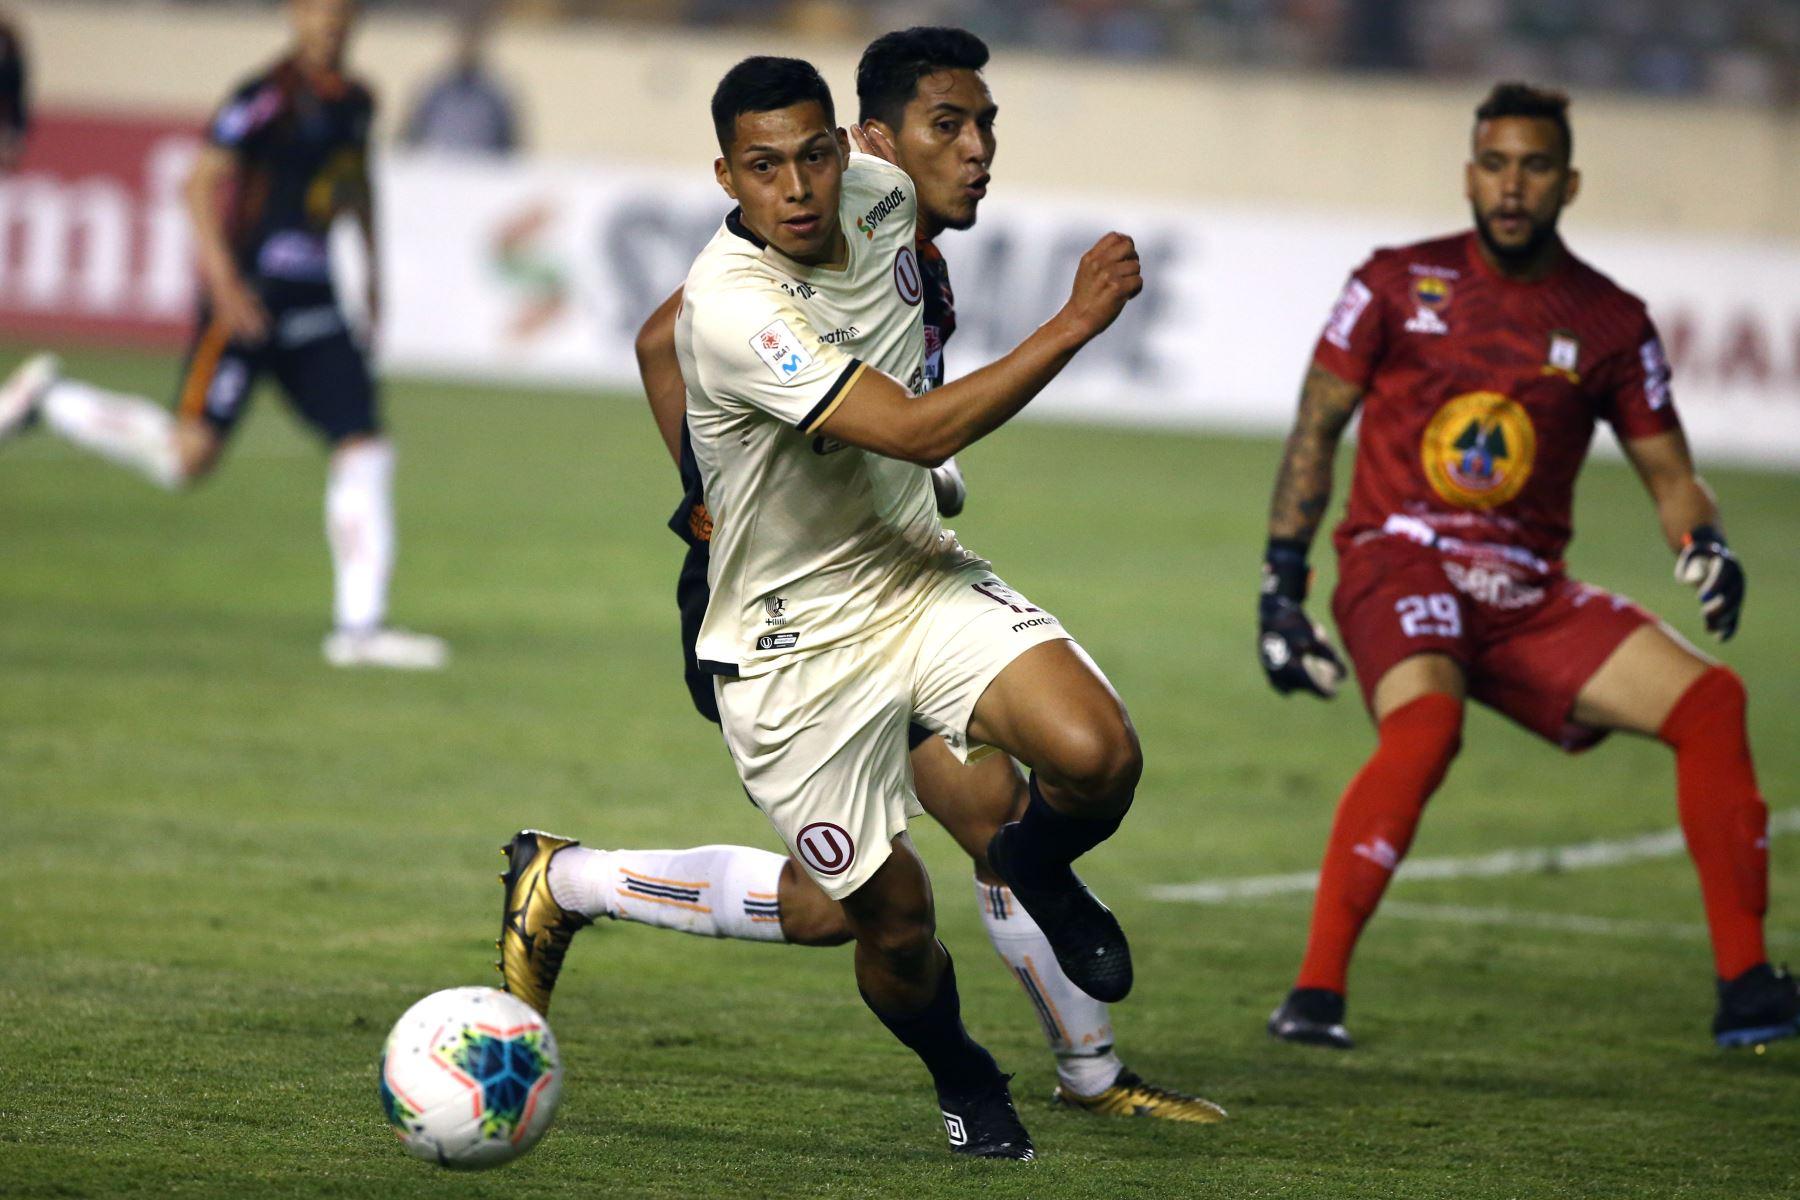 Universitario gana por 3 a 2 al Ayacucho FC. Foto: Foto: ANDINA/Vidal Tarqui